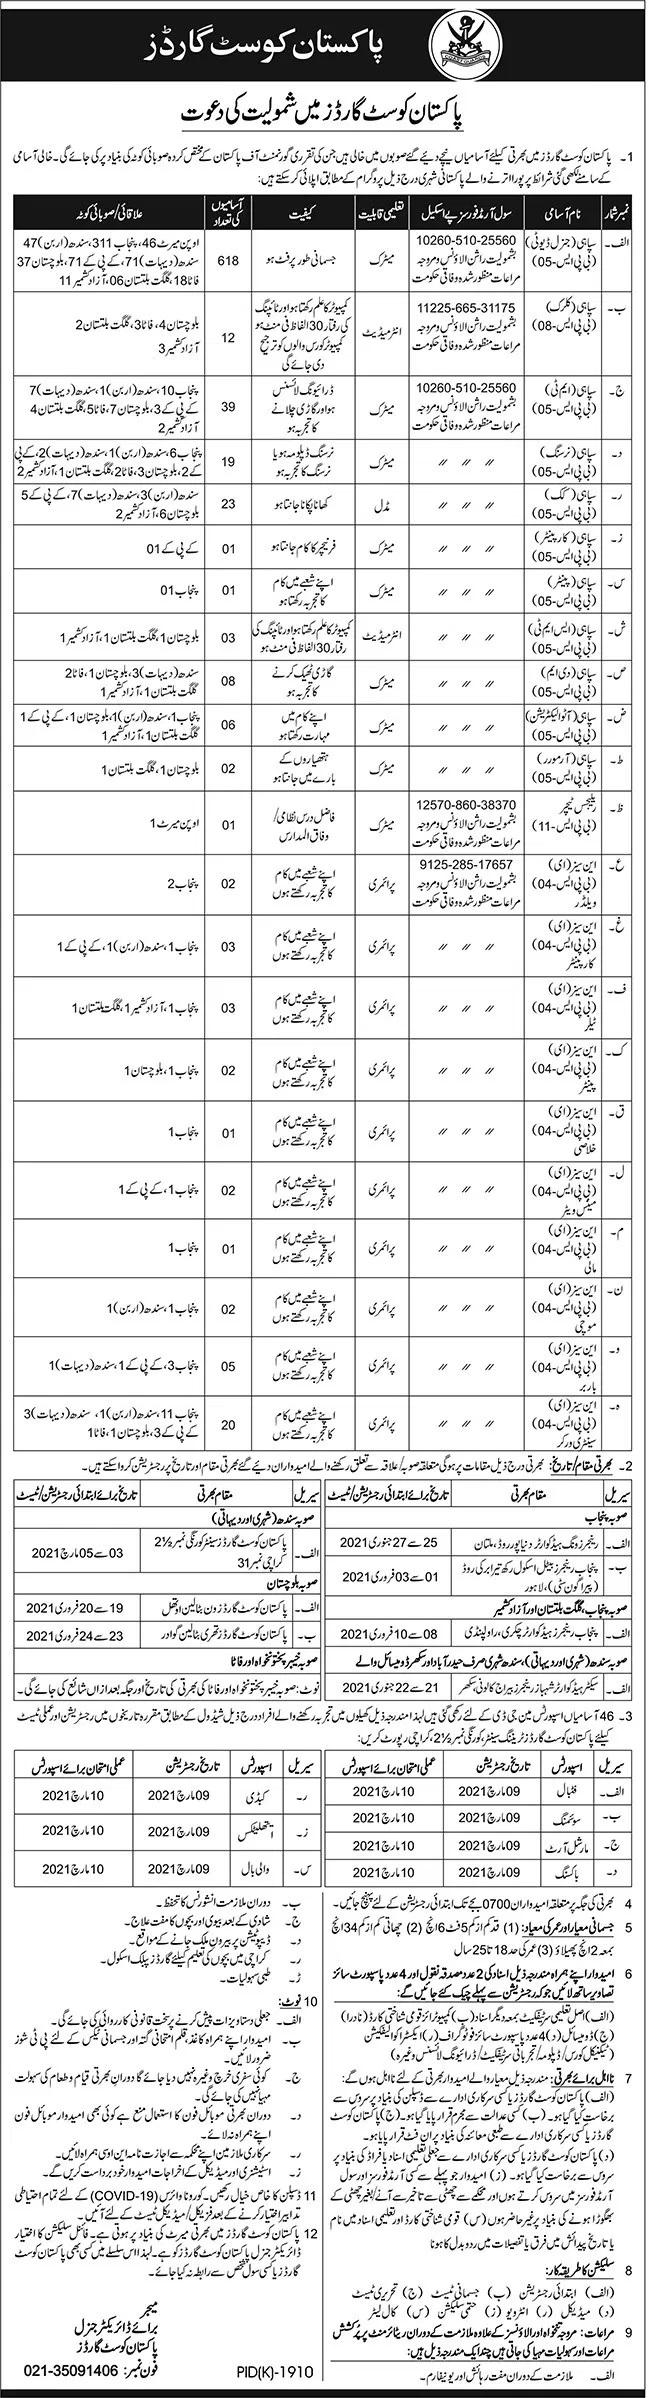 Pakistan Coast Guards Jobs 2021 Siphai, Clerks, Drivers, Cooks, SW's Apply Online